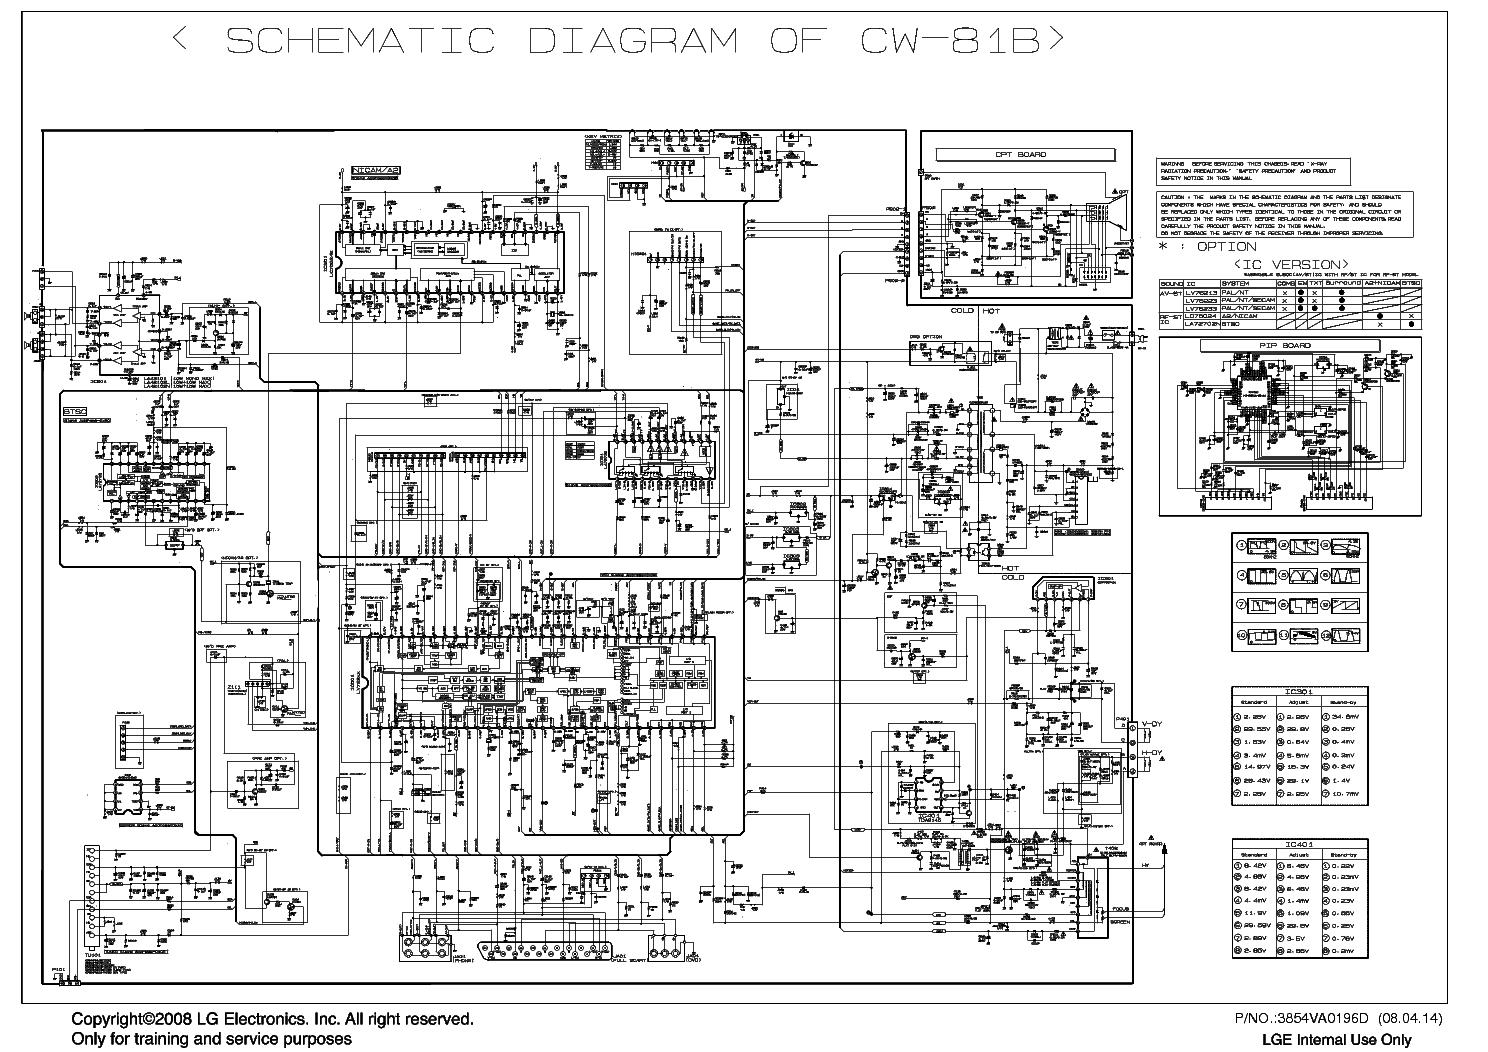 Lg 21fu6tl L4 21fj8rl L4 Chassis Cw 81b Sch Service Manual Download  Schematics  Eeprom  Repair